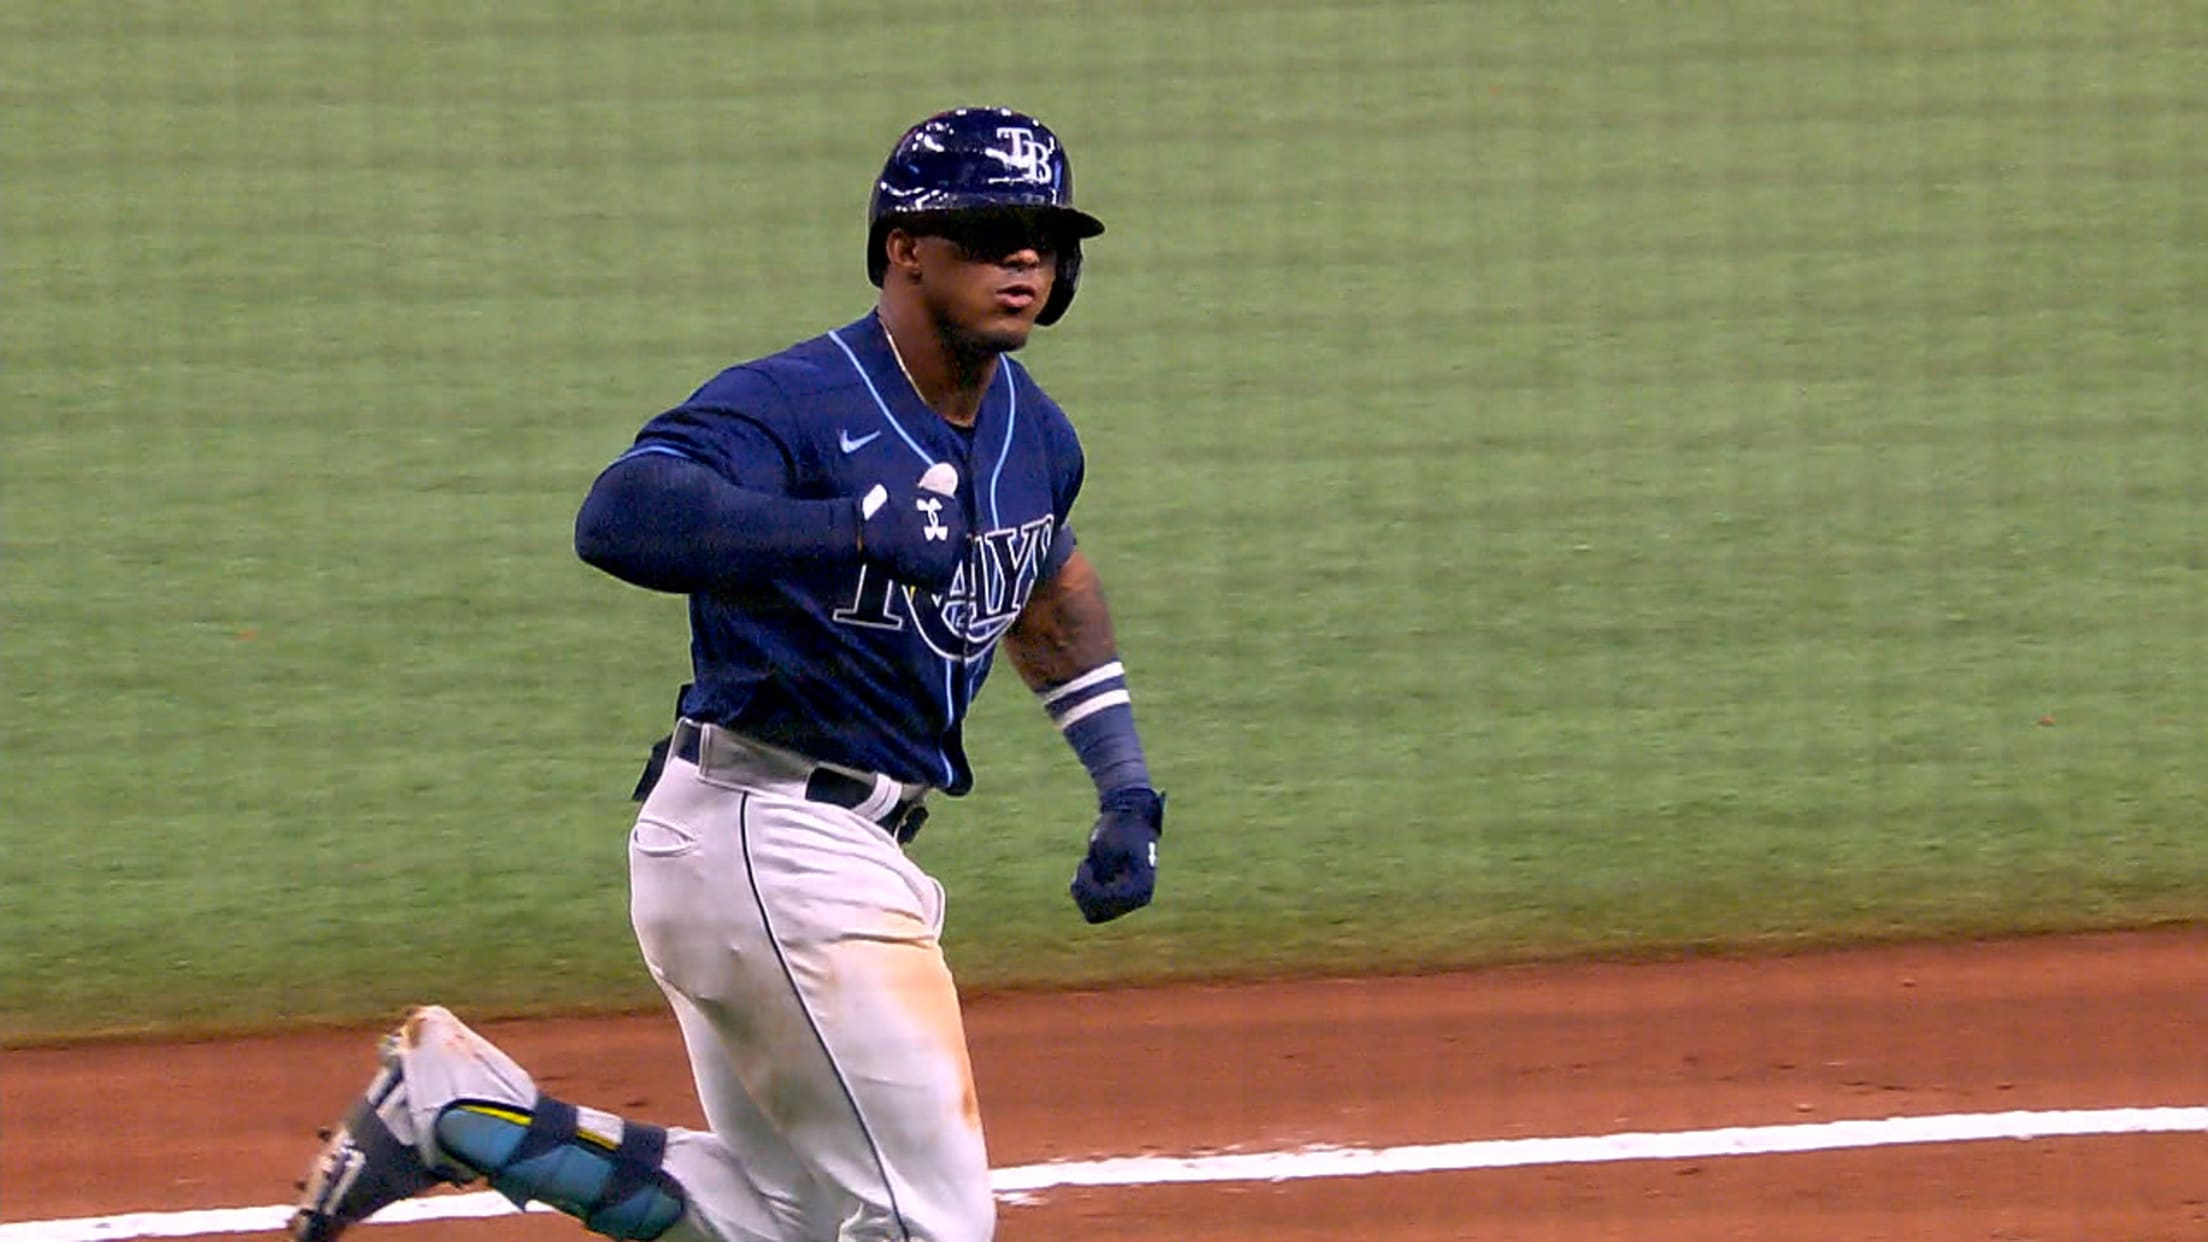 Wander Franco's first hit, homer